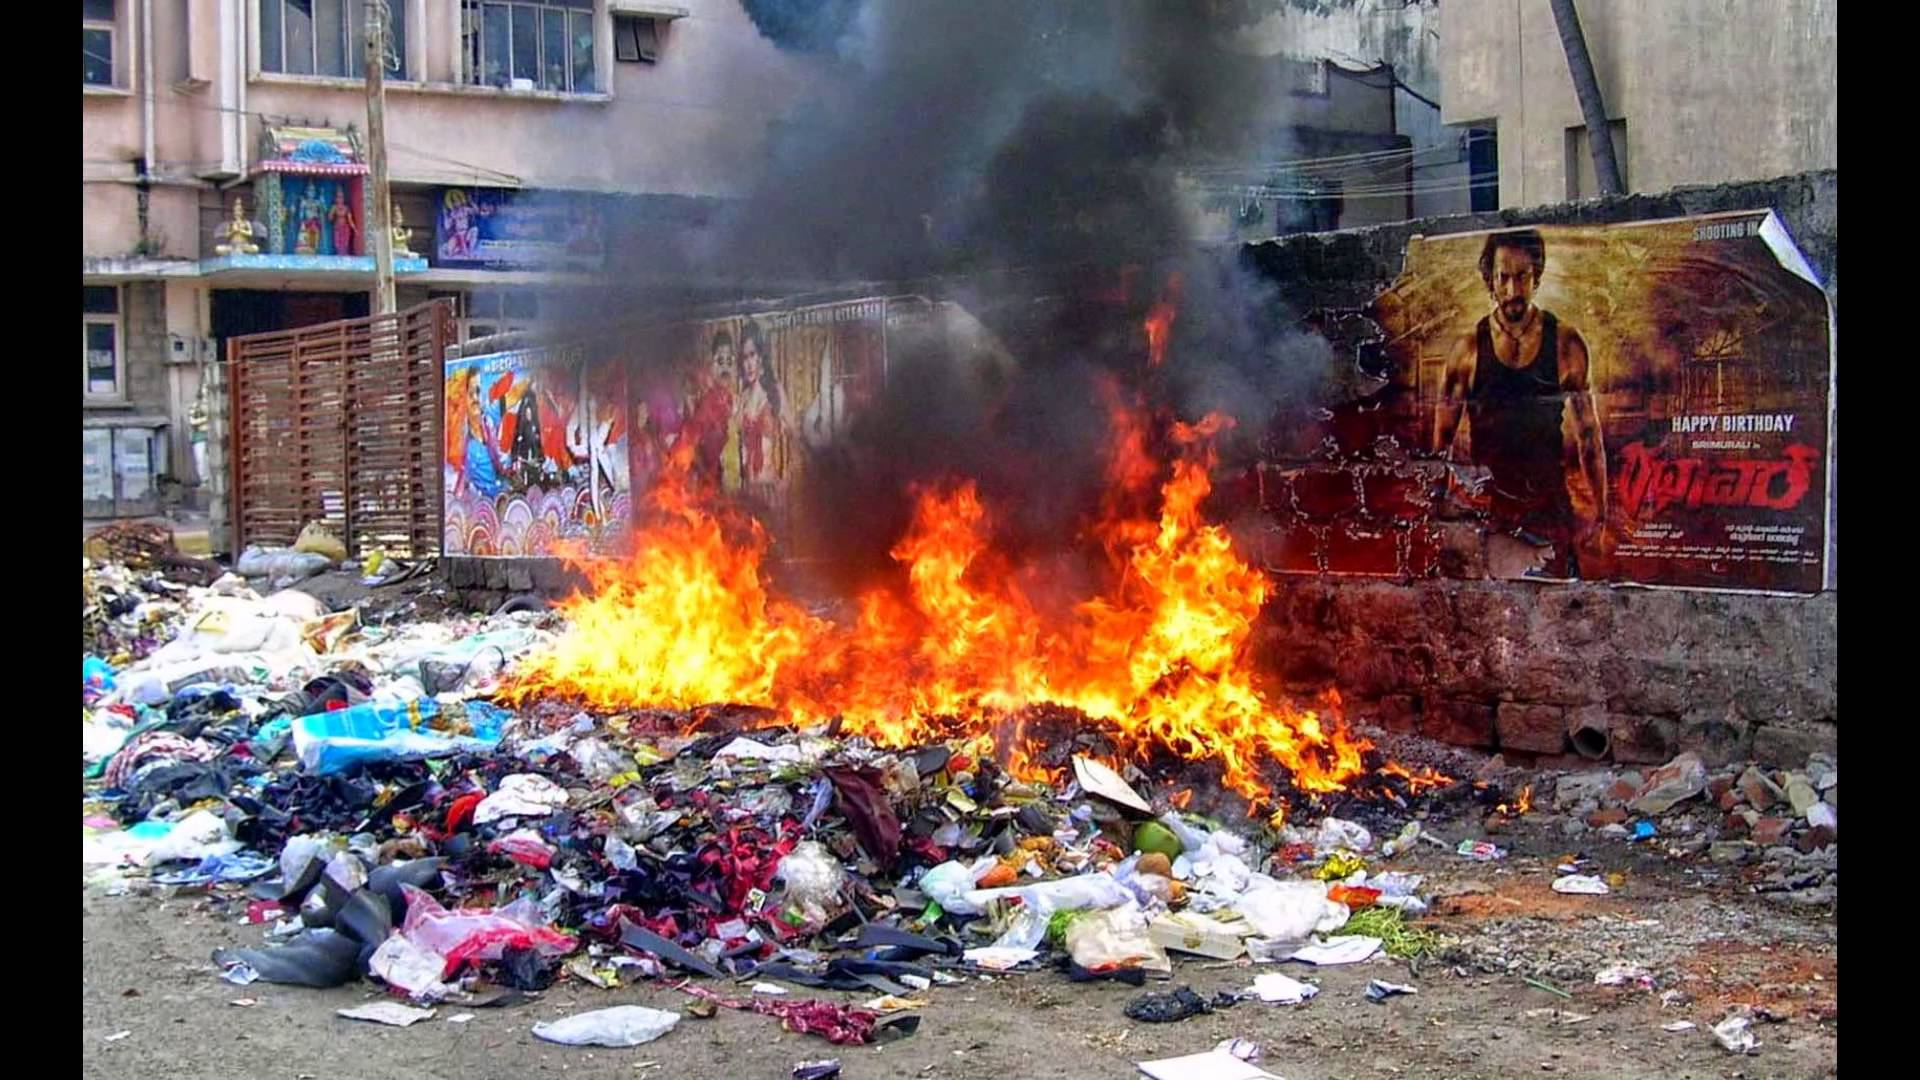 Garbage being disposed by burning at a garbage dump - YouTube